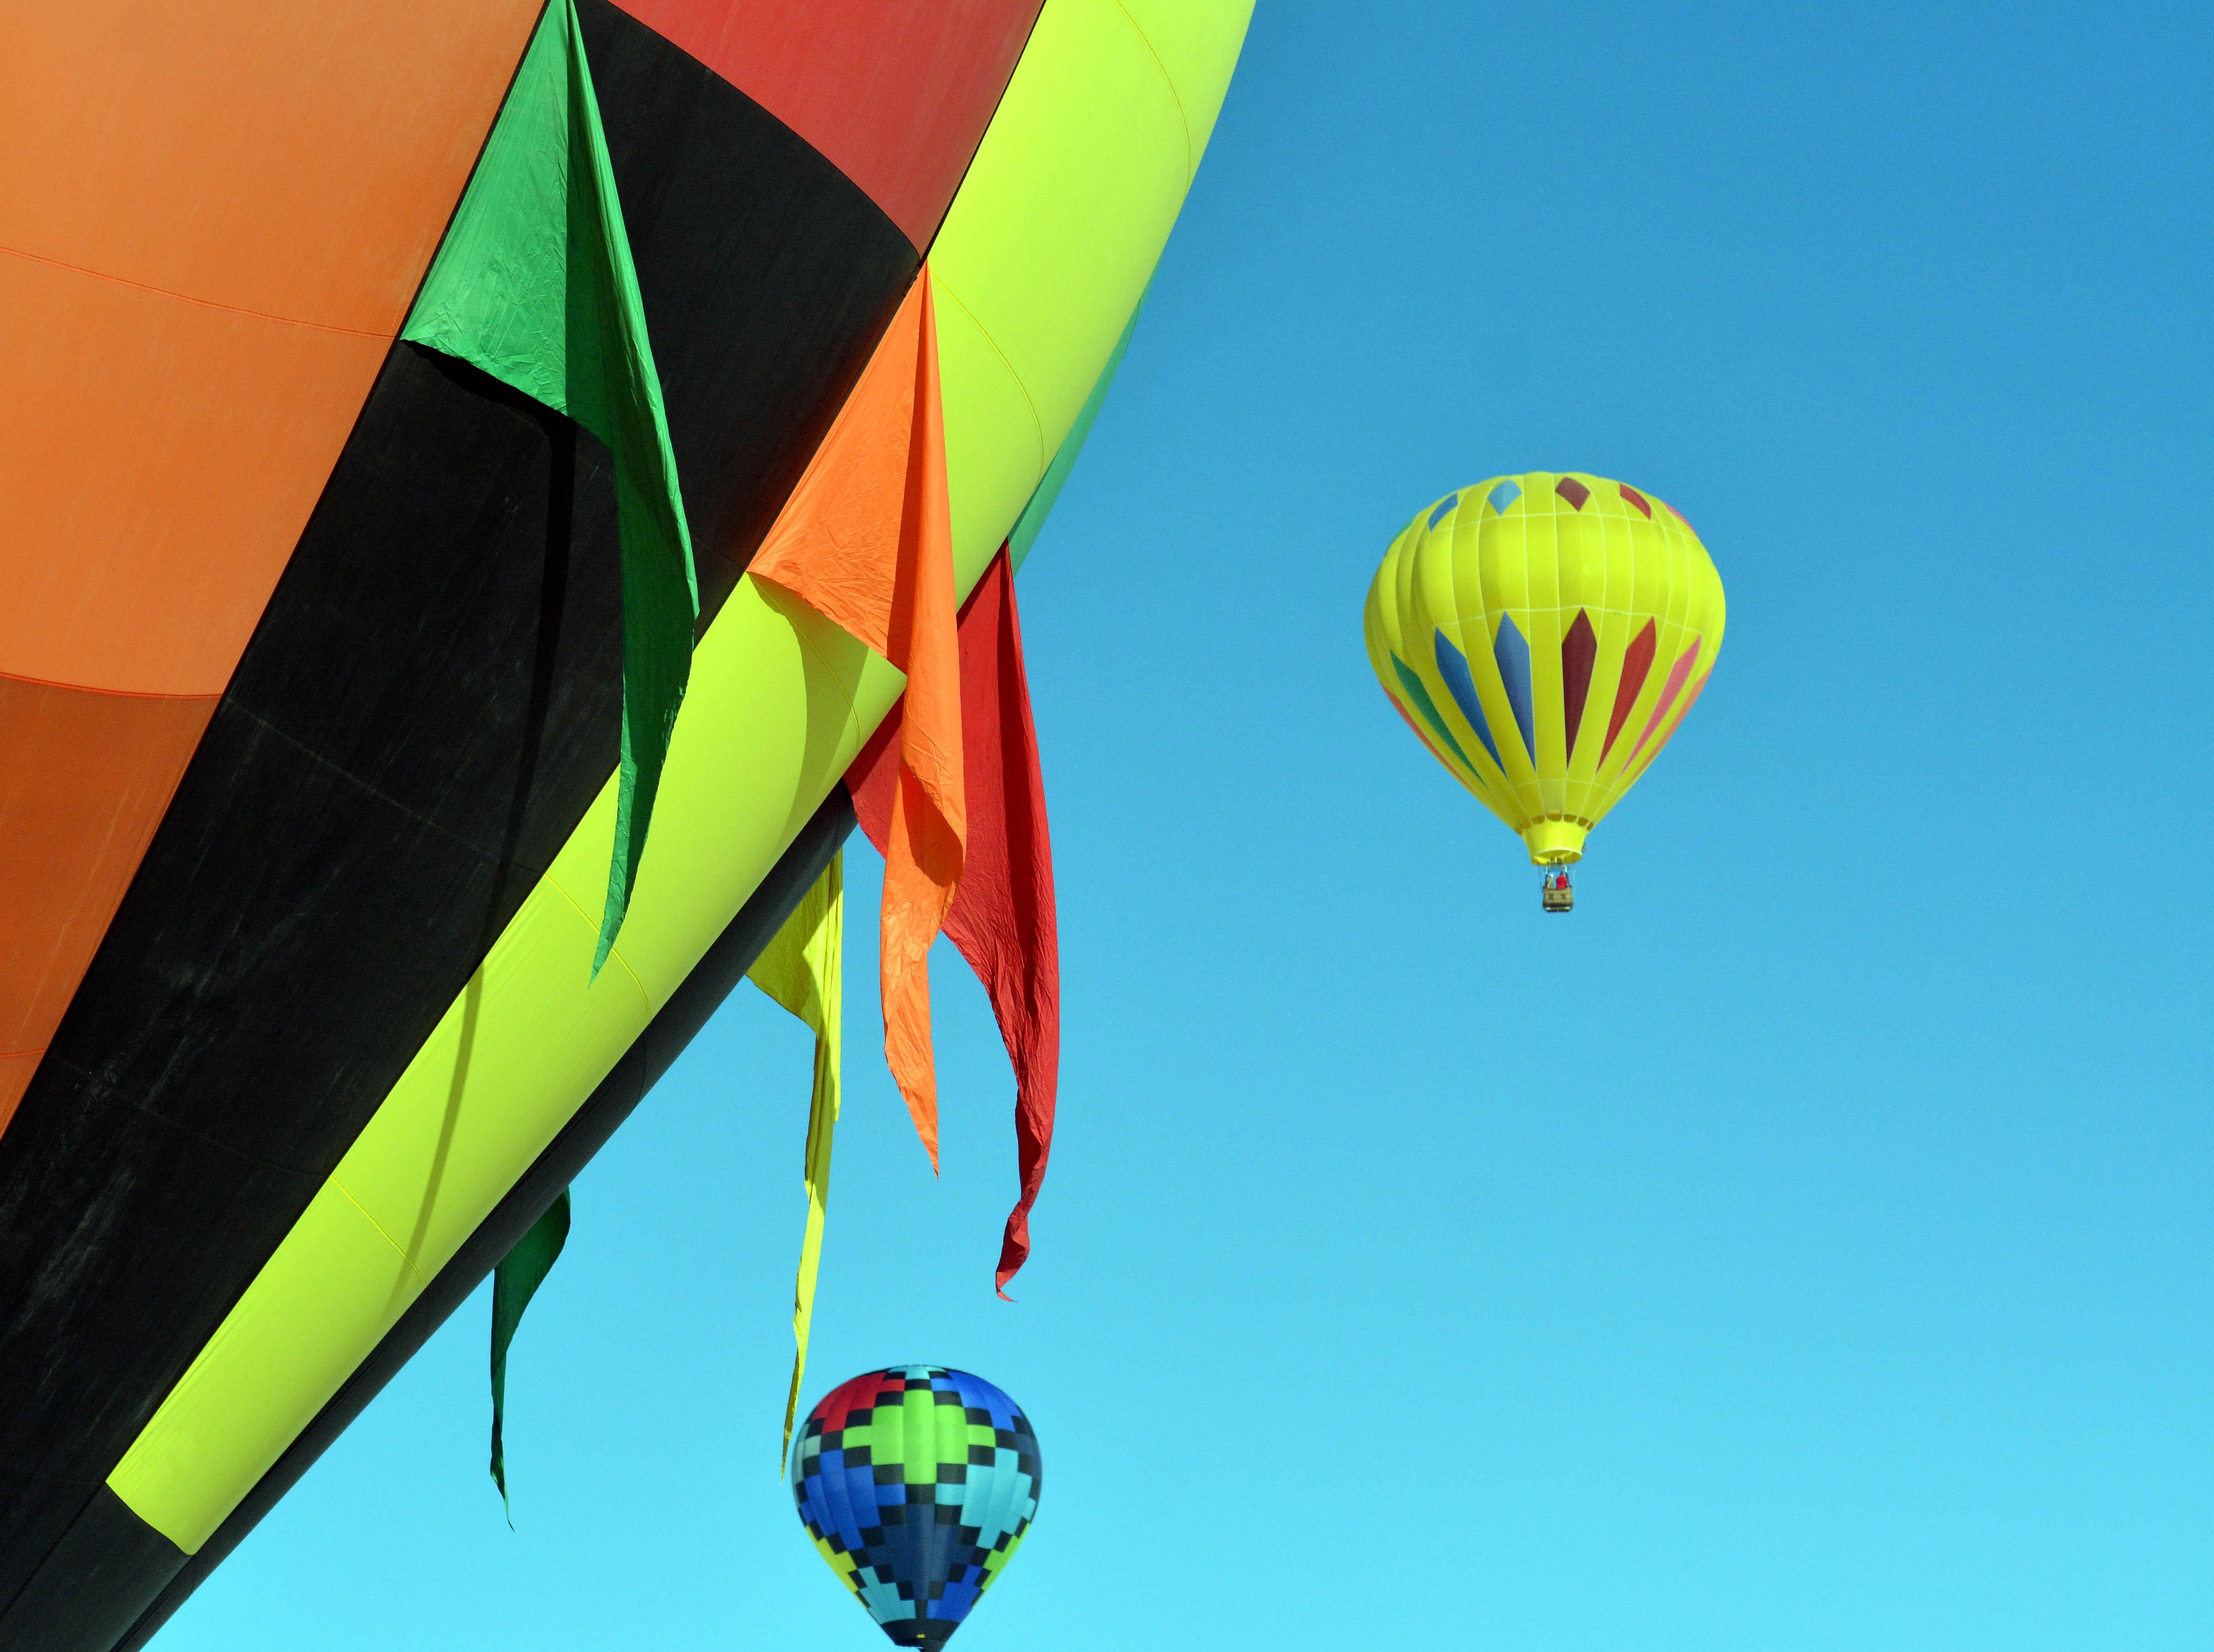 Hot air balloons take flight Saturday, Sept. 15, 2018 at the White Sands Balloon Invitational.